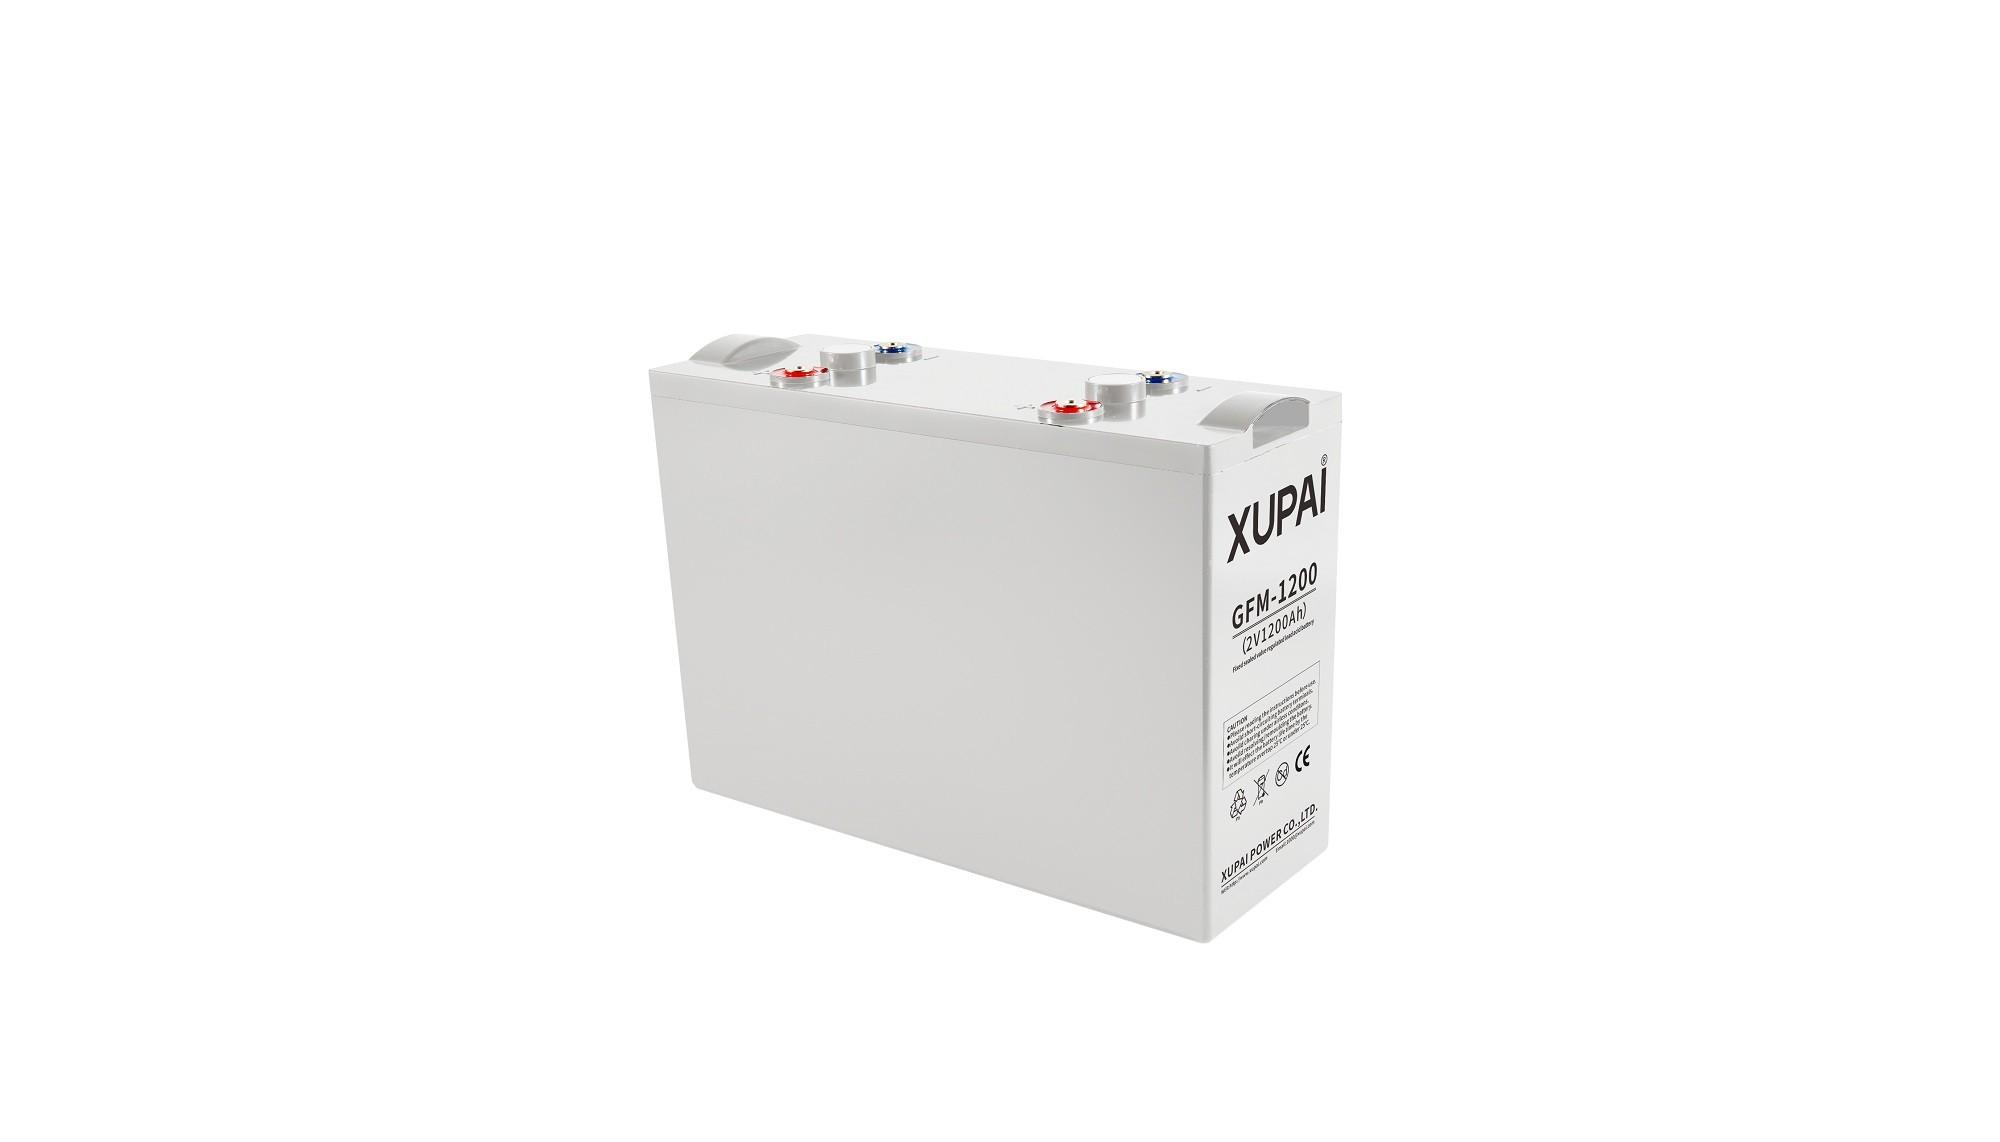 XUPAI GFM-1200 long life backup  base station battery